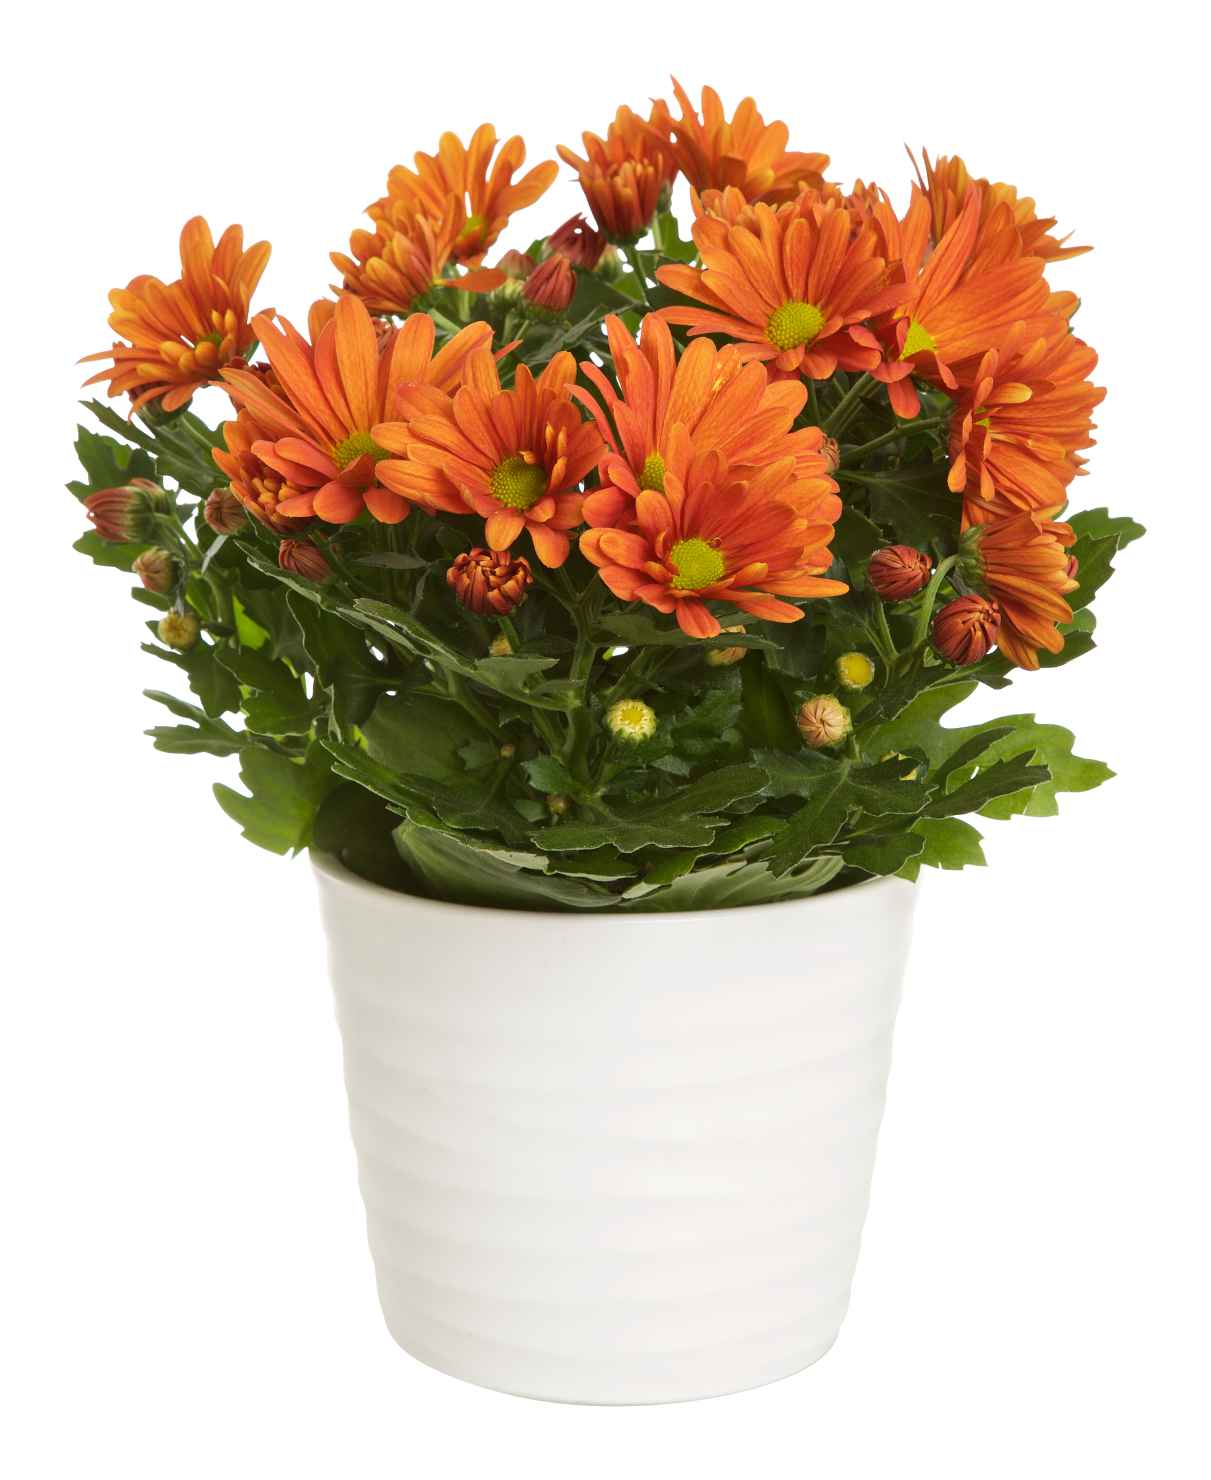 Produktbild på Krysantemum 3-pl. orange